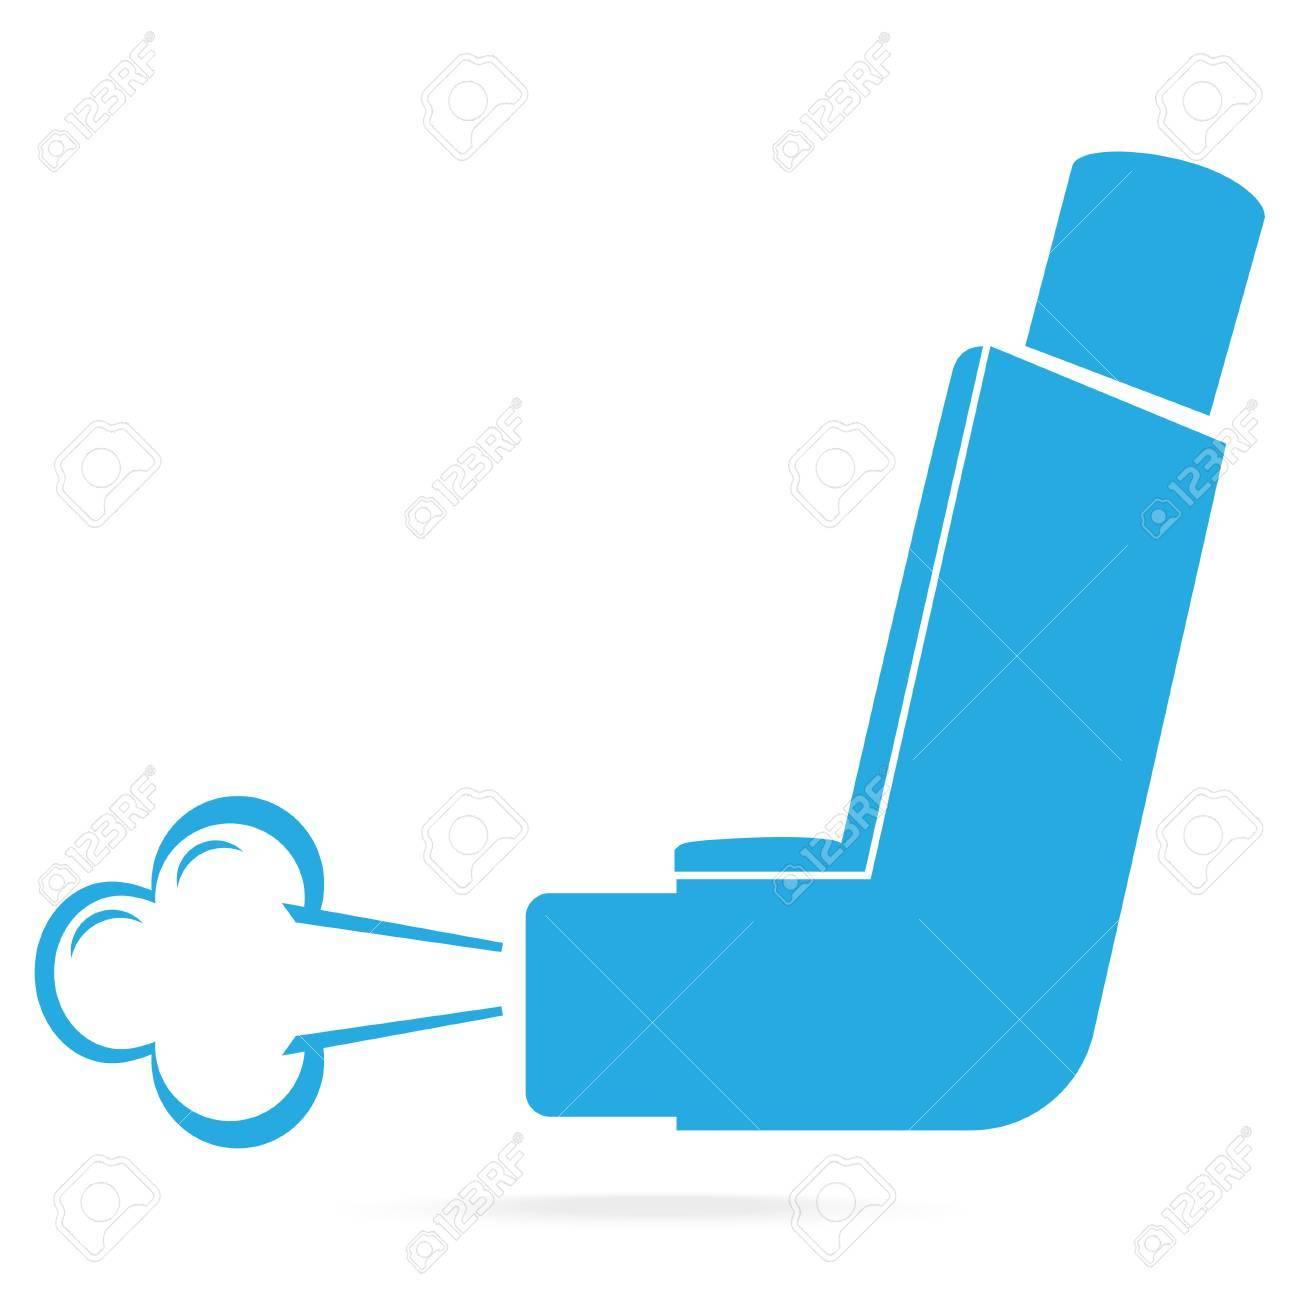 Asthma inhaler blue icon. Medicine symbol illustration.